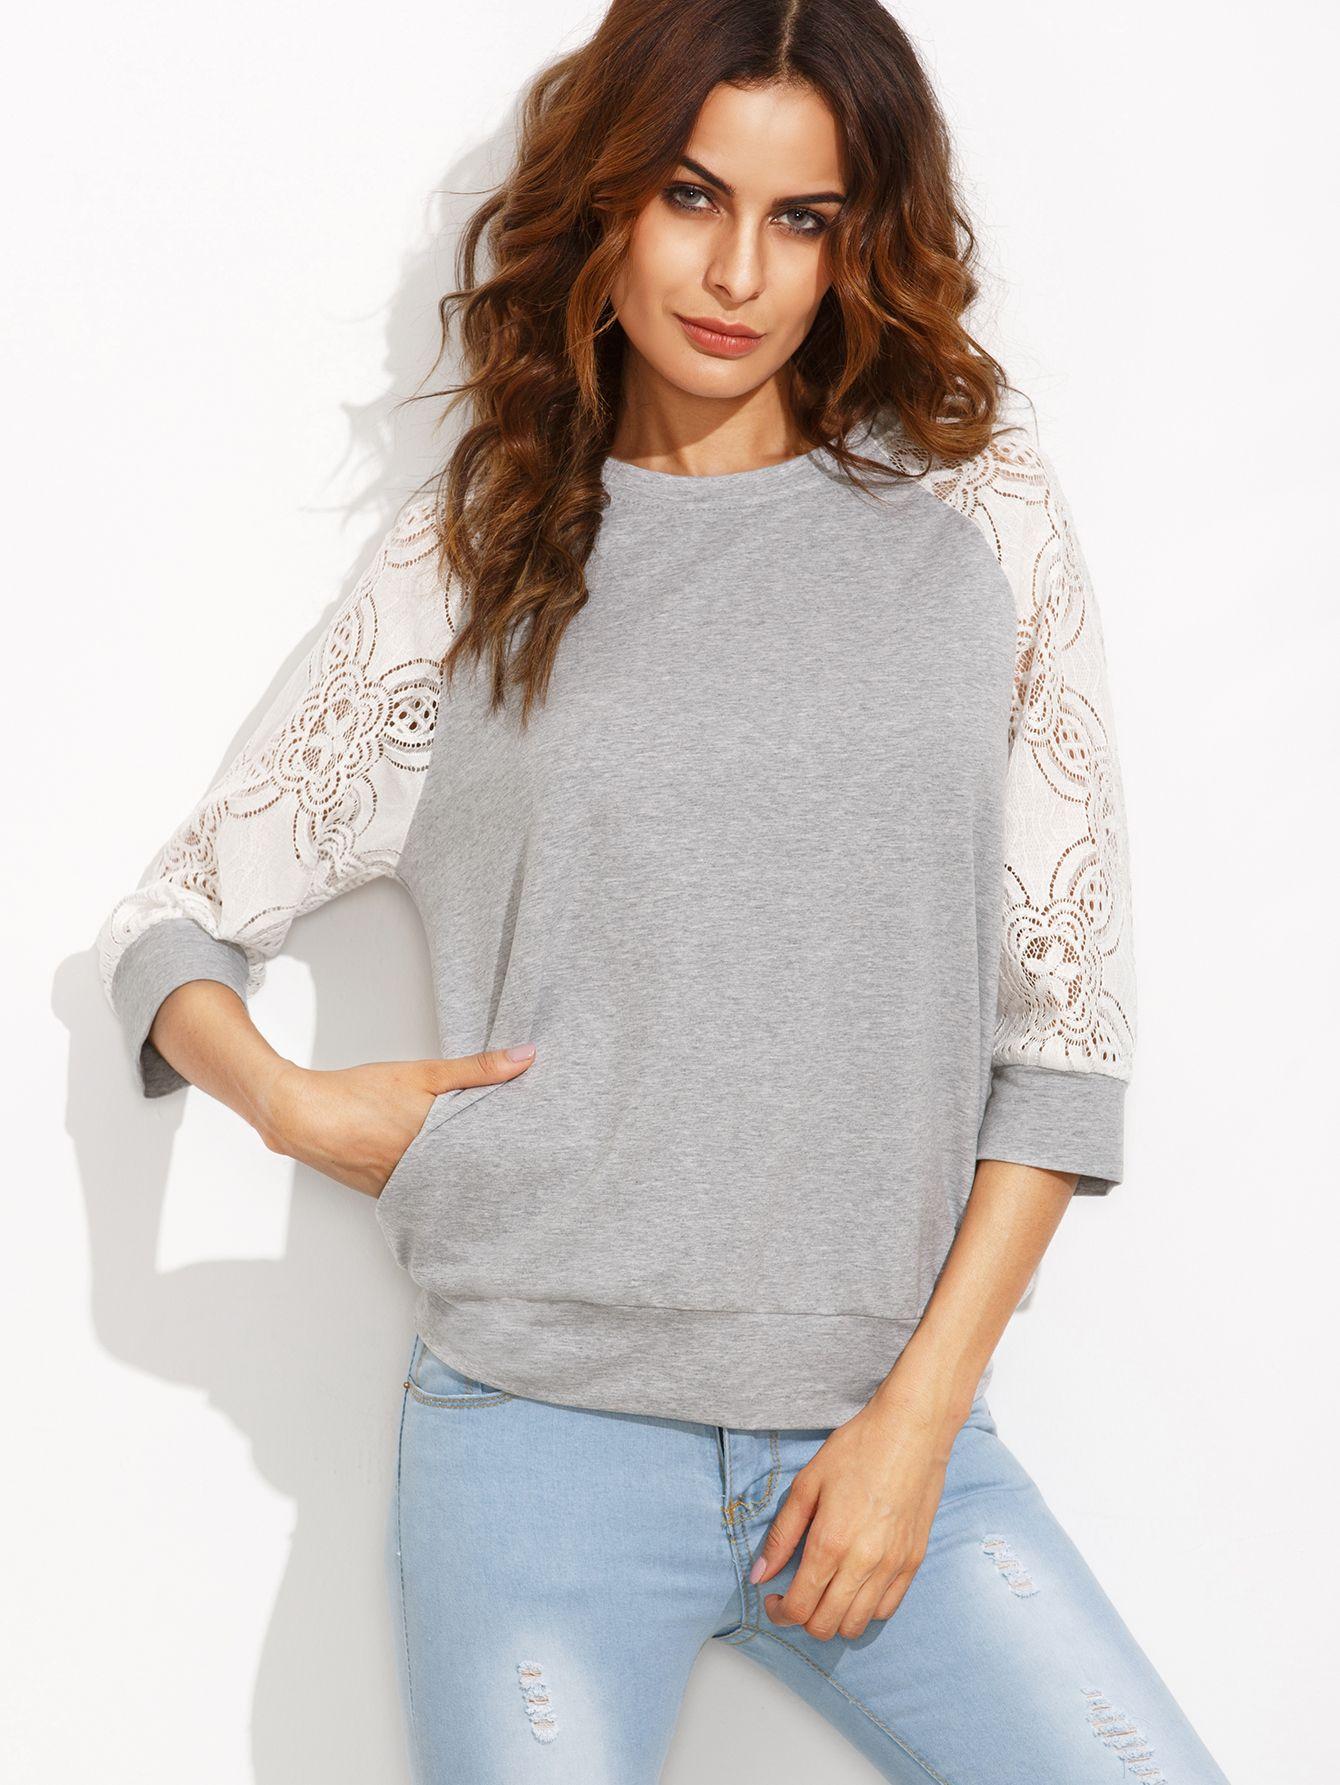 Heather+Grey+Contrast+Lace+Raglan+Sleeve+Sweatshirt+21.00